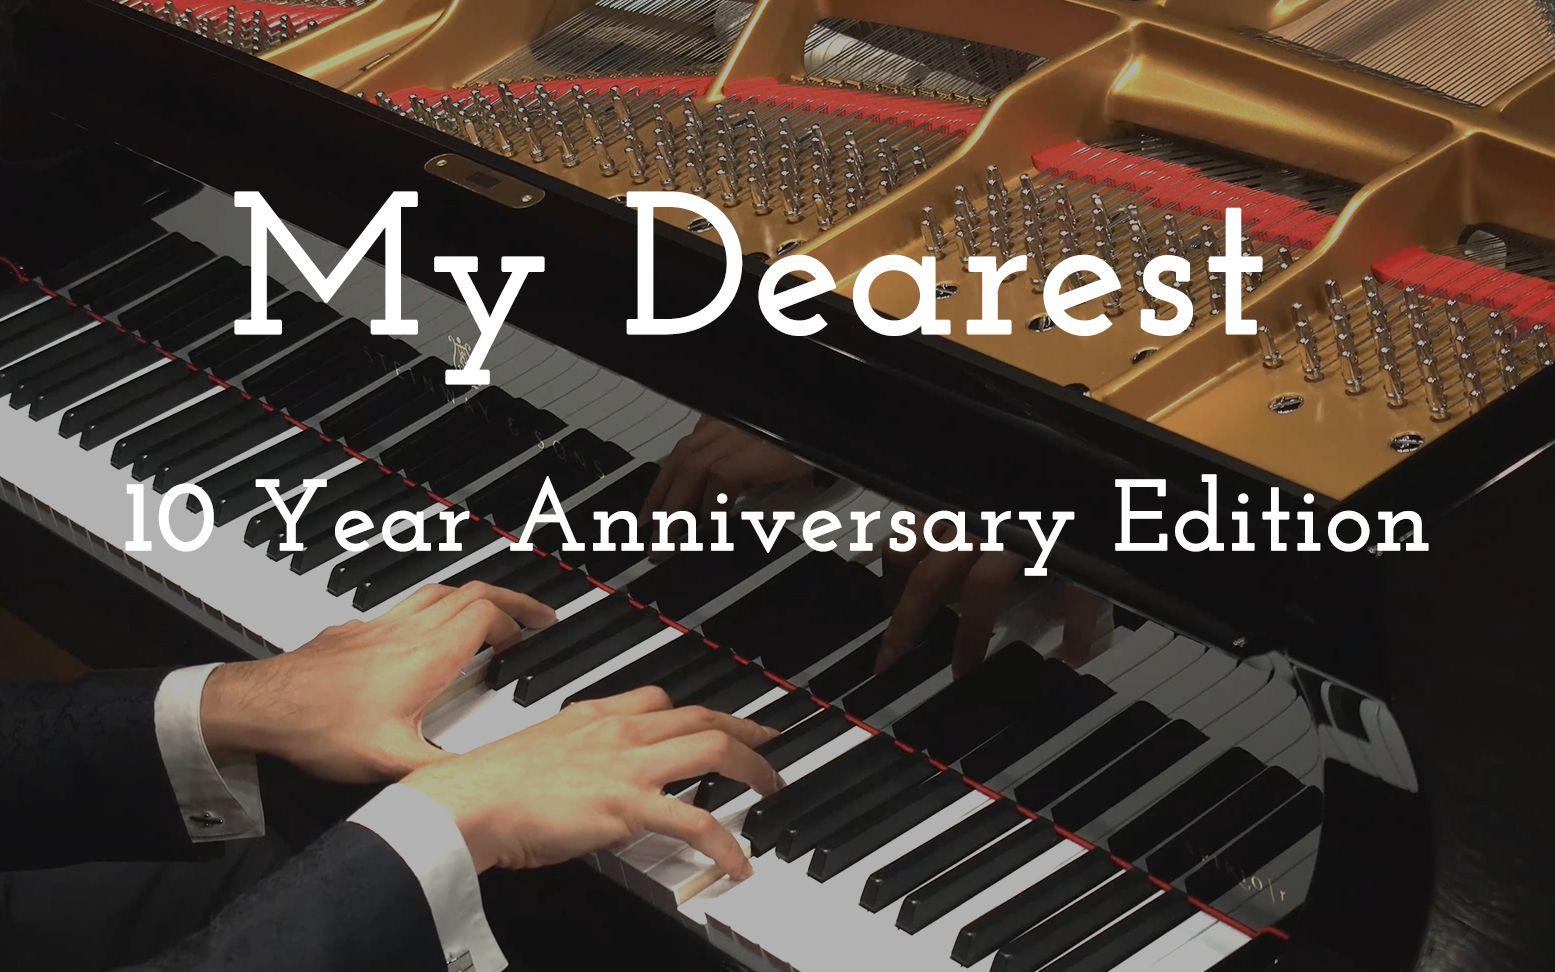 【Animenz】My Dearest - 罪恶王冠OP 钢琴版(十周年特别版)_哔哩哔哩 (゜-゜)つロ 干杯~-bilibili